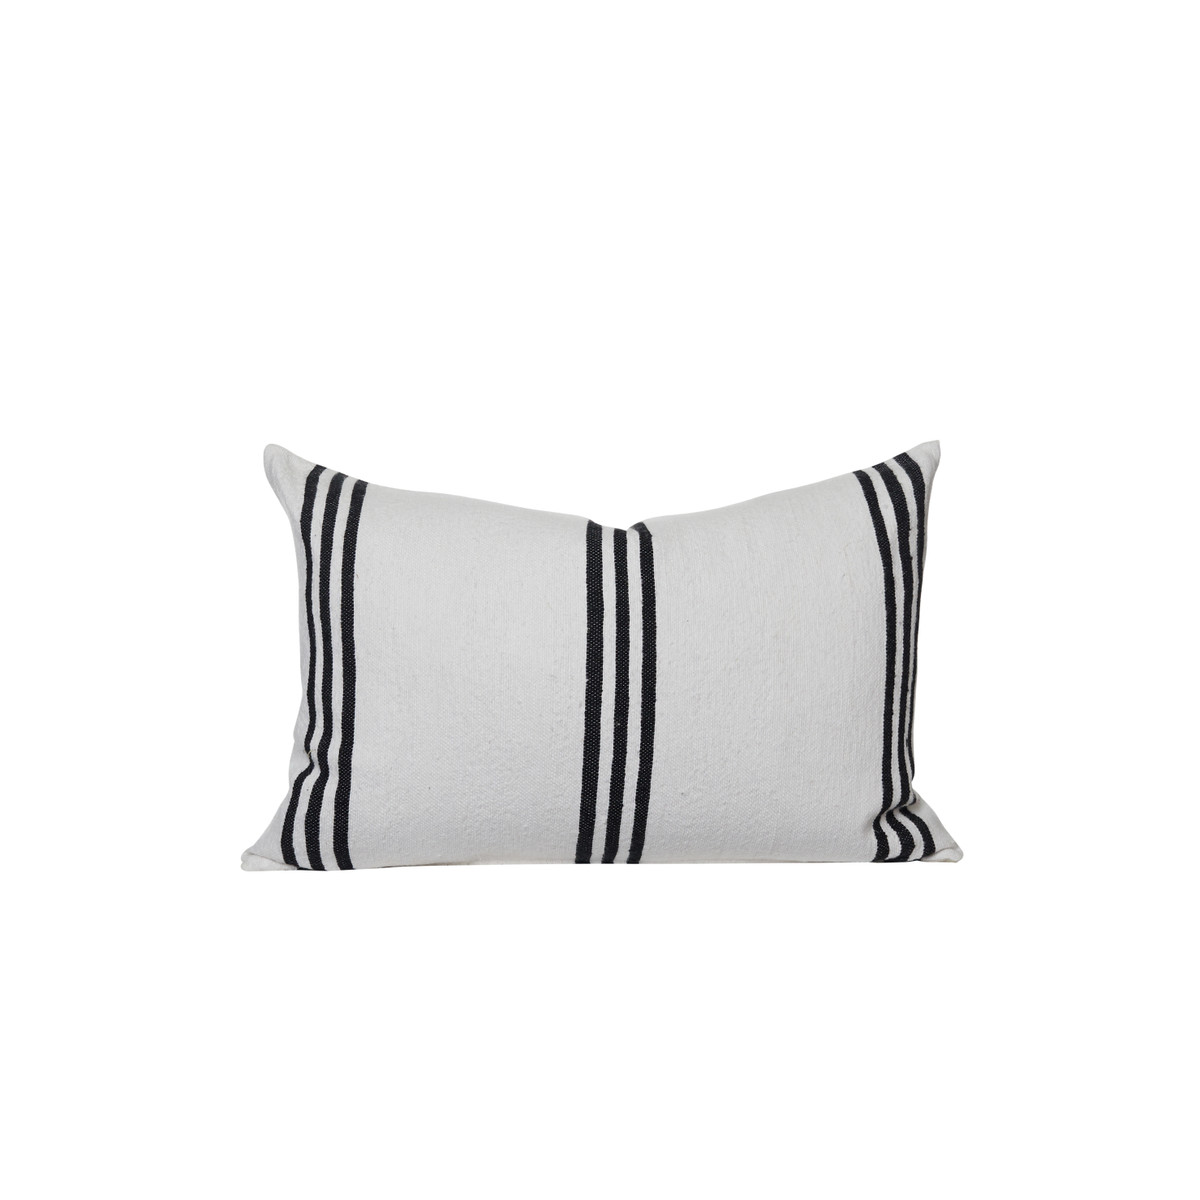 Three Stripe White and Black Cotton Stripe Moroccan Decorative Lumbar Pillow - front